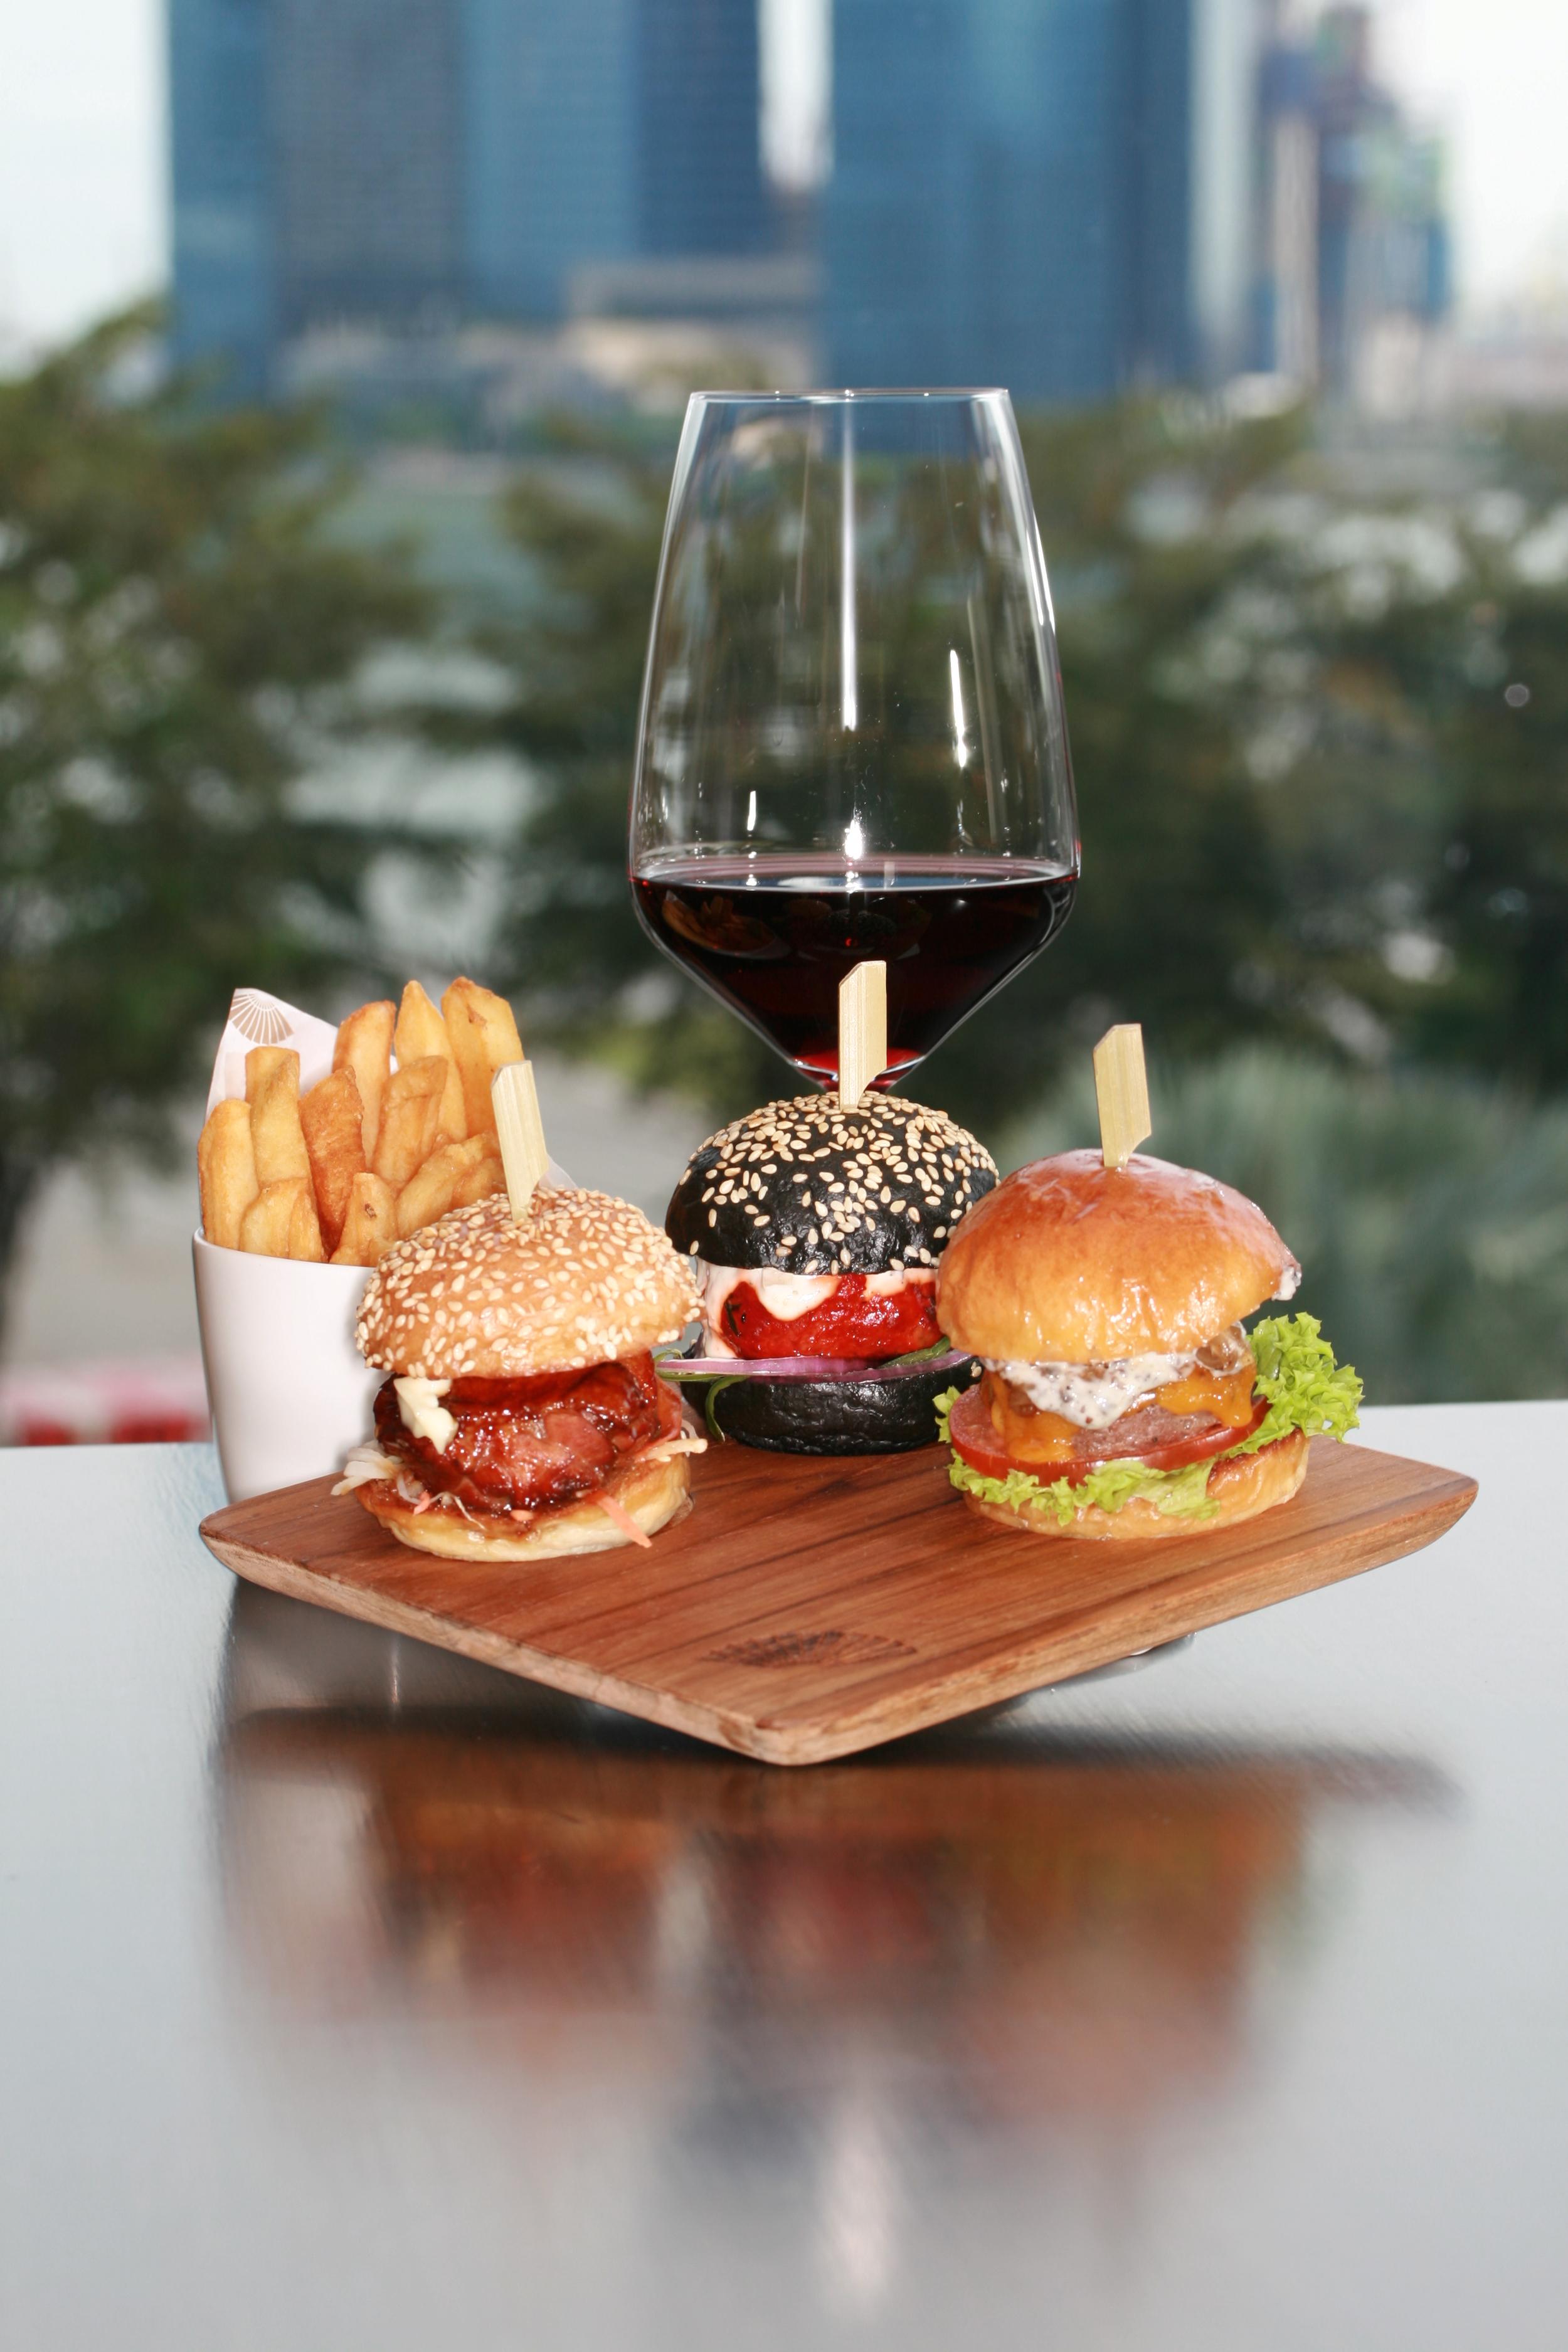 Burgers and Burgundy at Axis Bar and Lounge   Photo Credit: Mandarin Oriental, Singapore